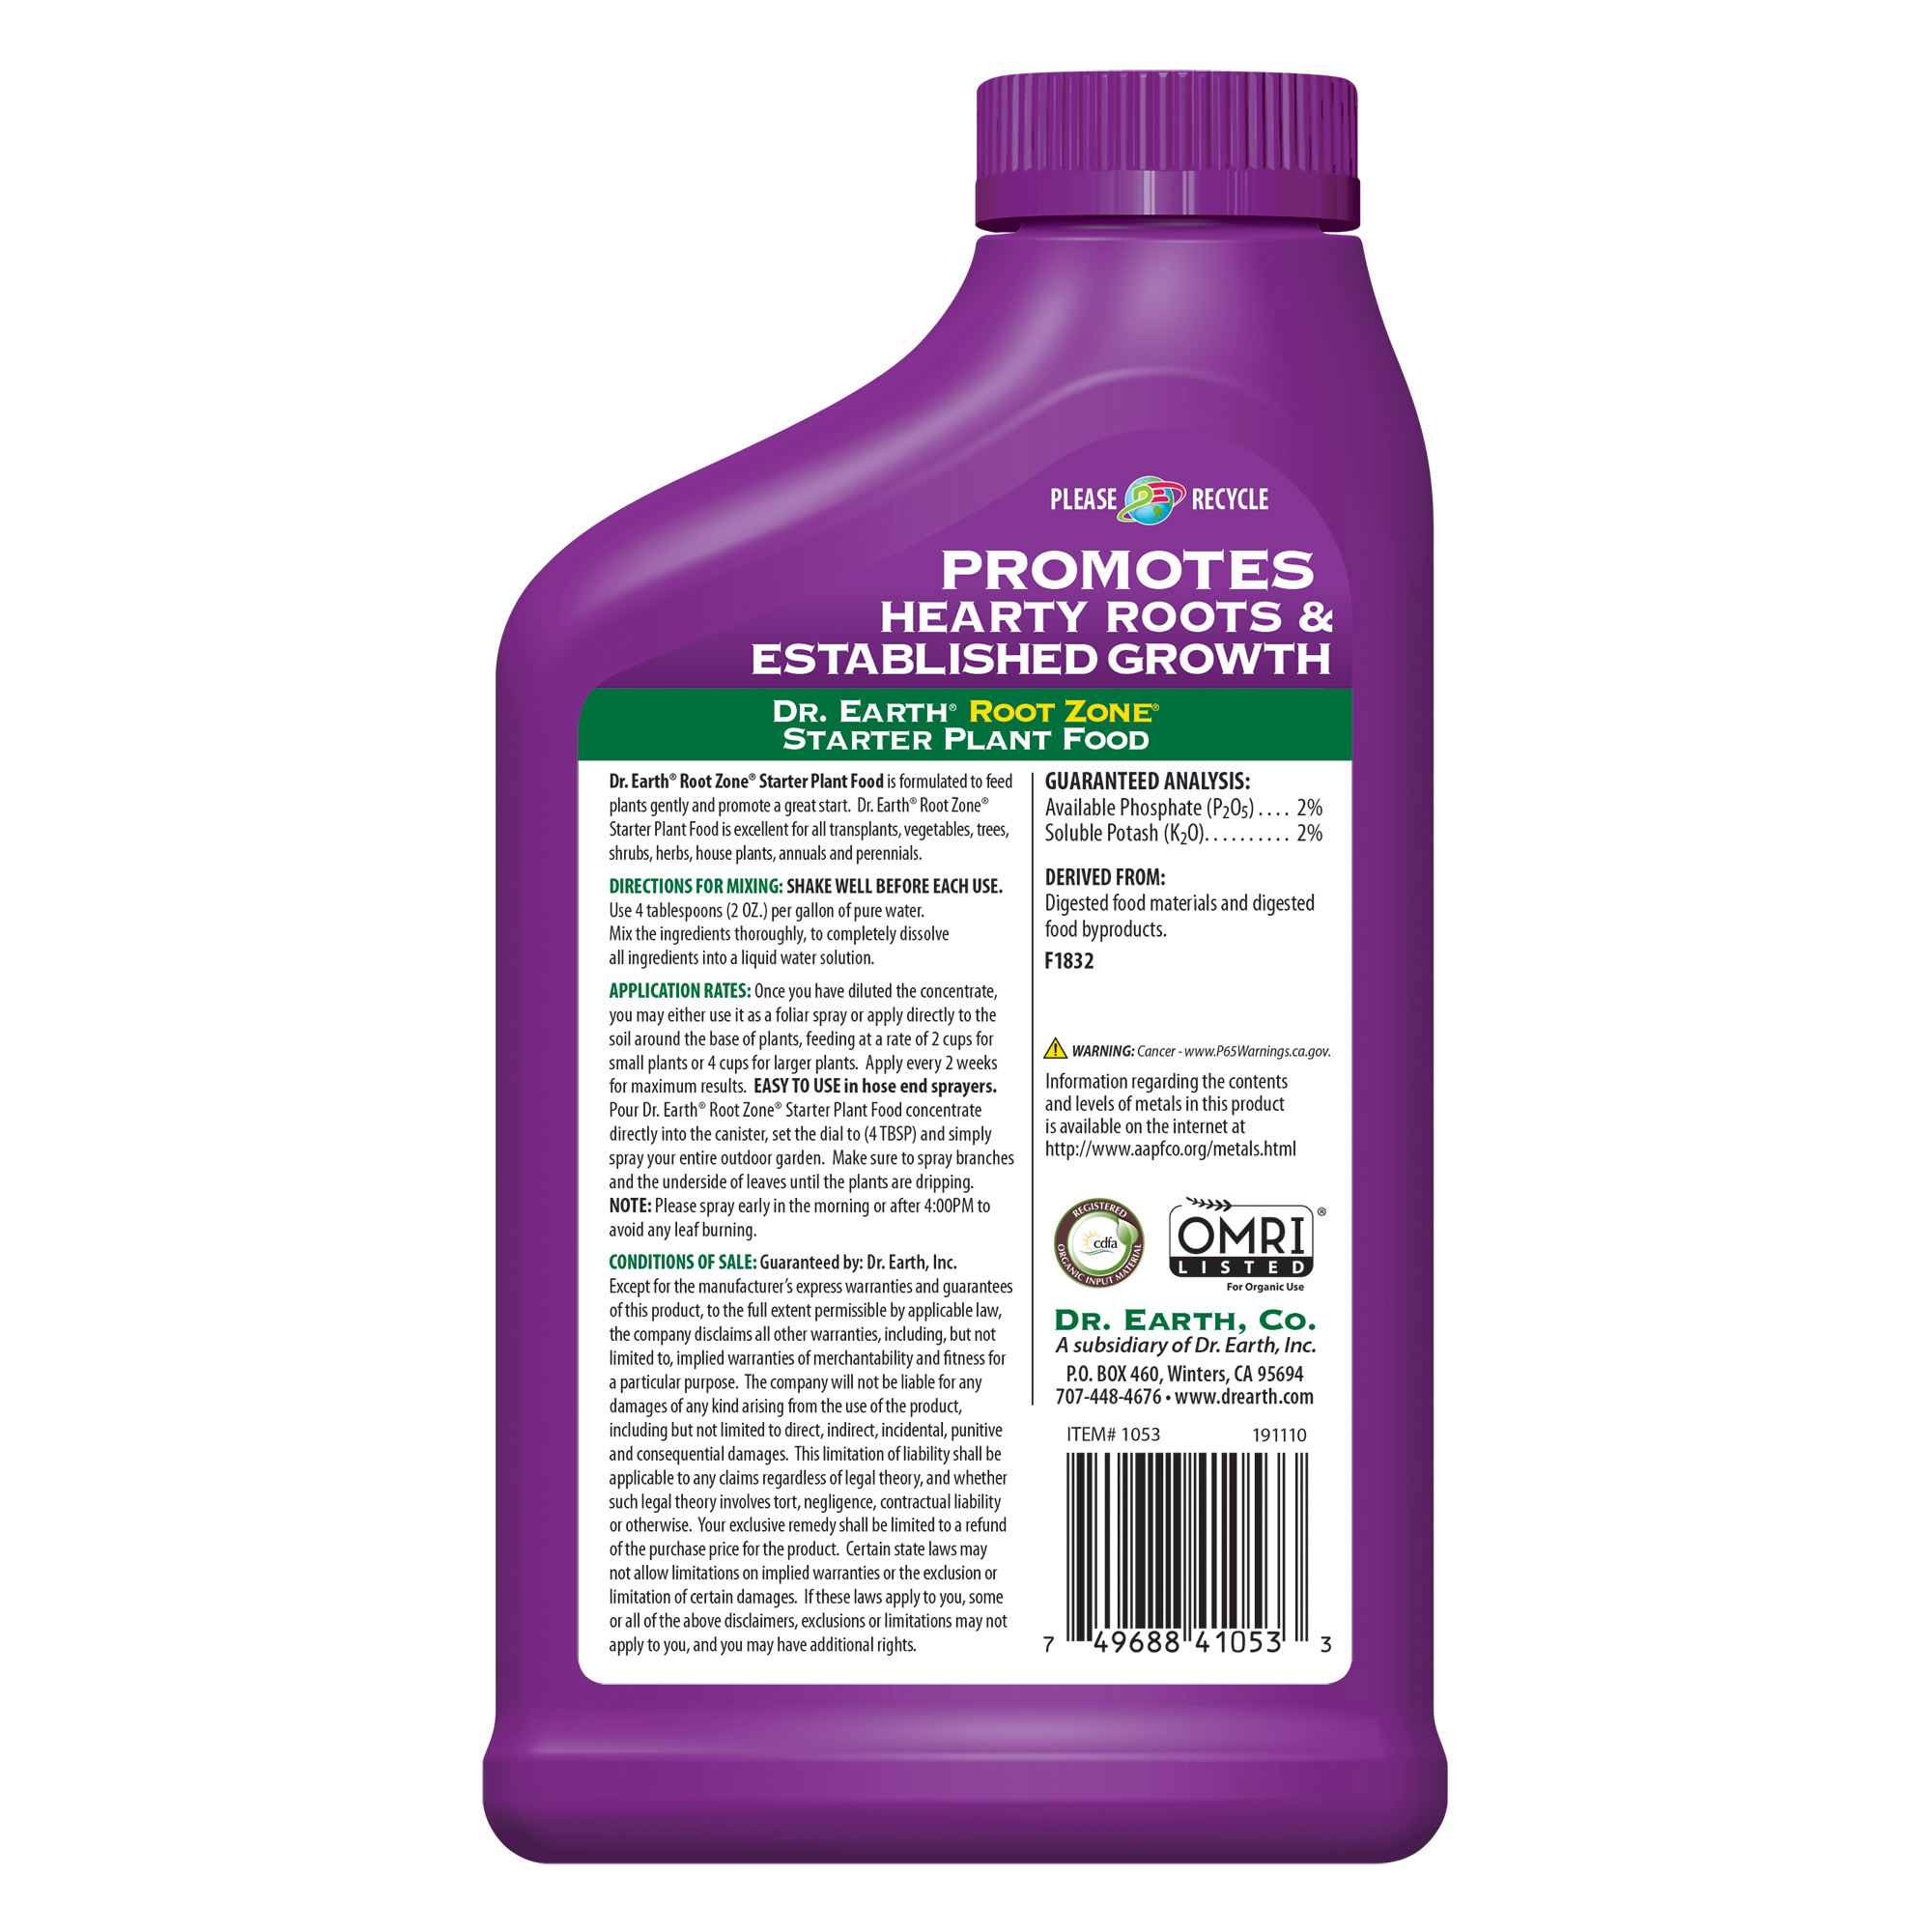 Root Zone Liquid Fertilizer Product Information